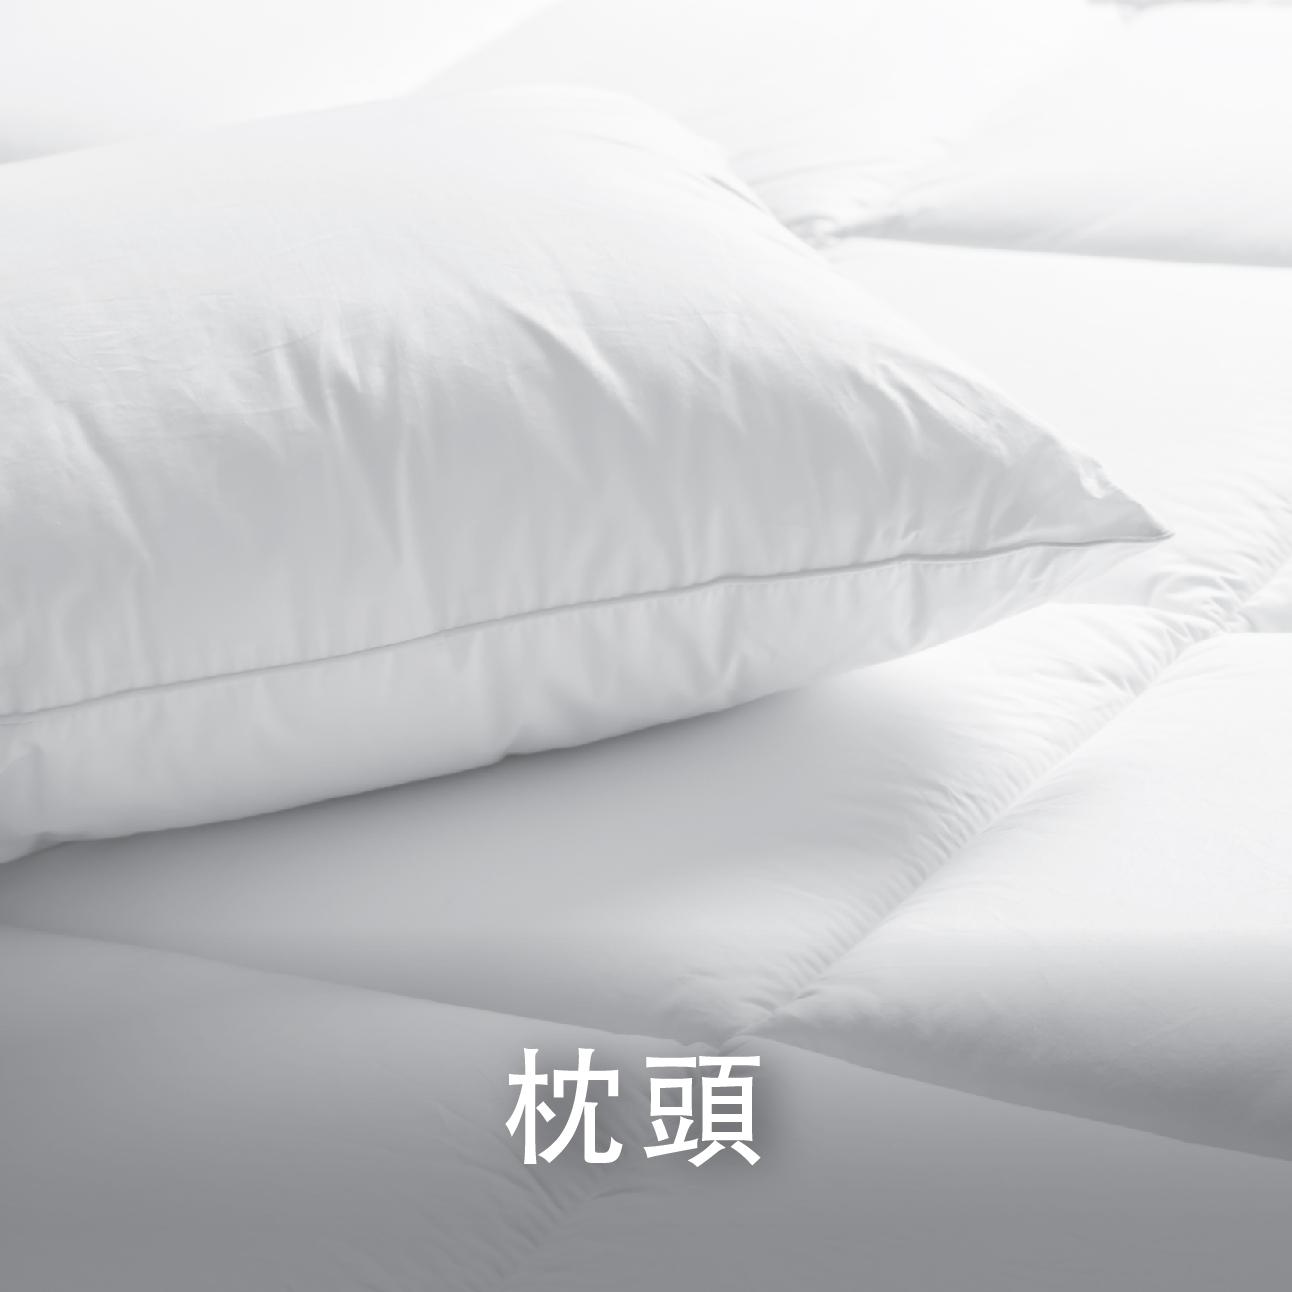 Catalogue_Banner310Wx310H_px-Pillow-chi